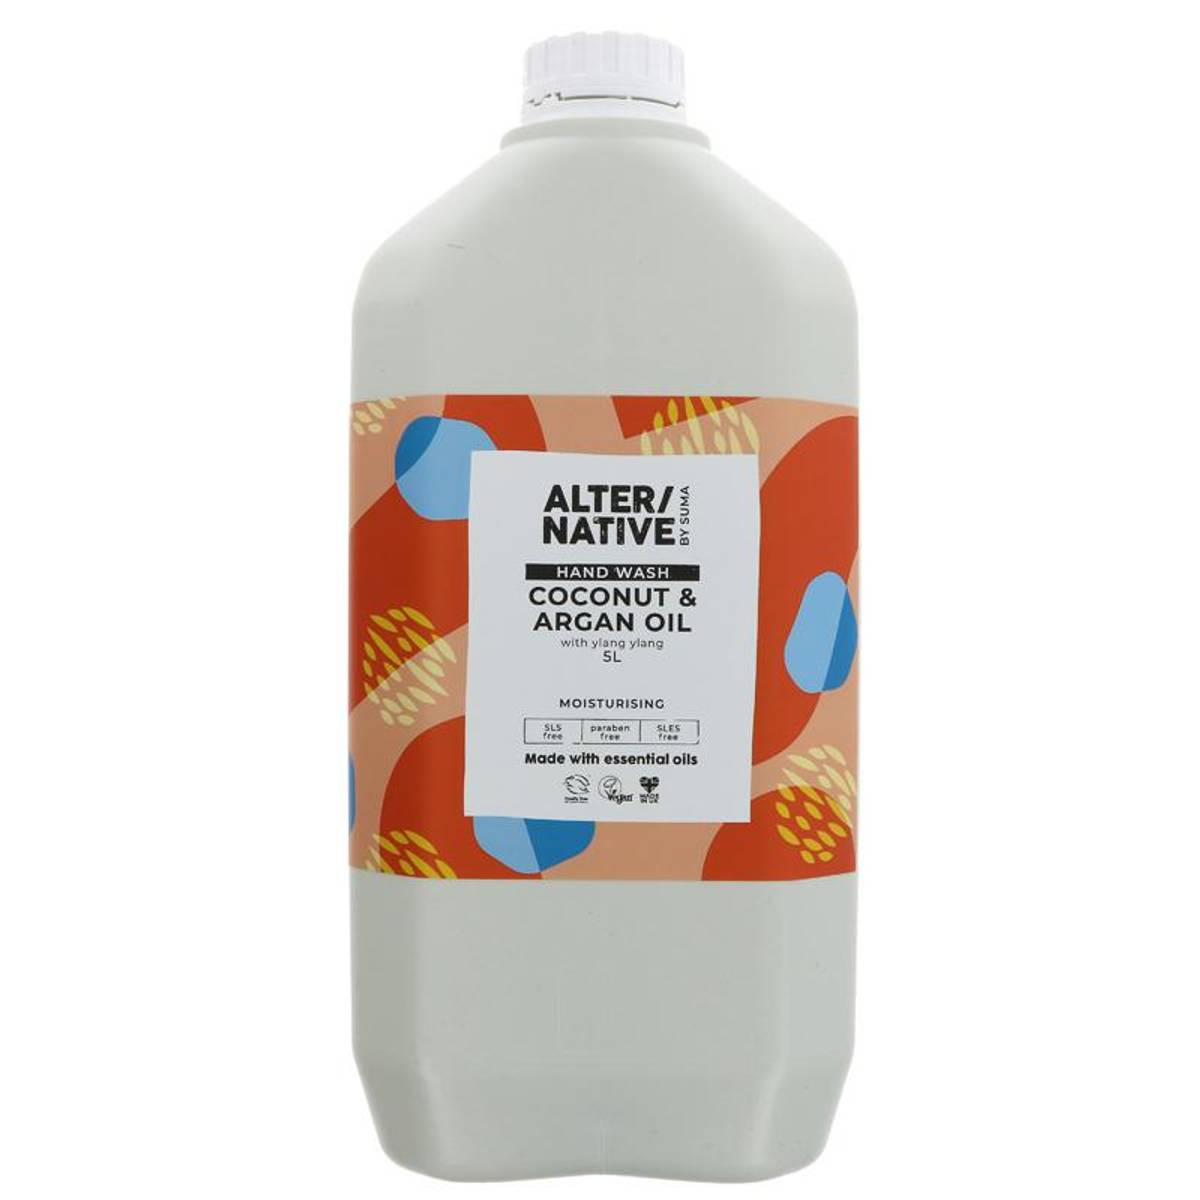 5L flytende håndsåpe Coconut & Argan Oil / Alter/native